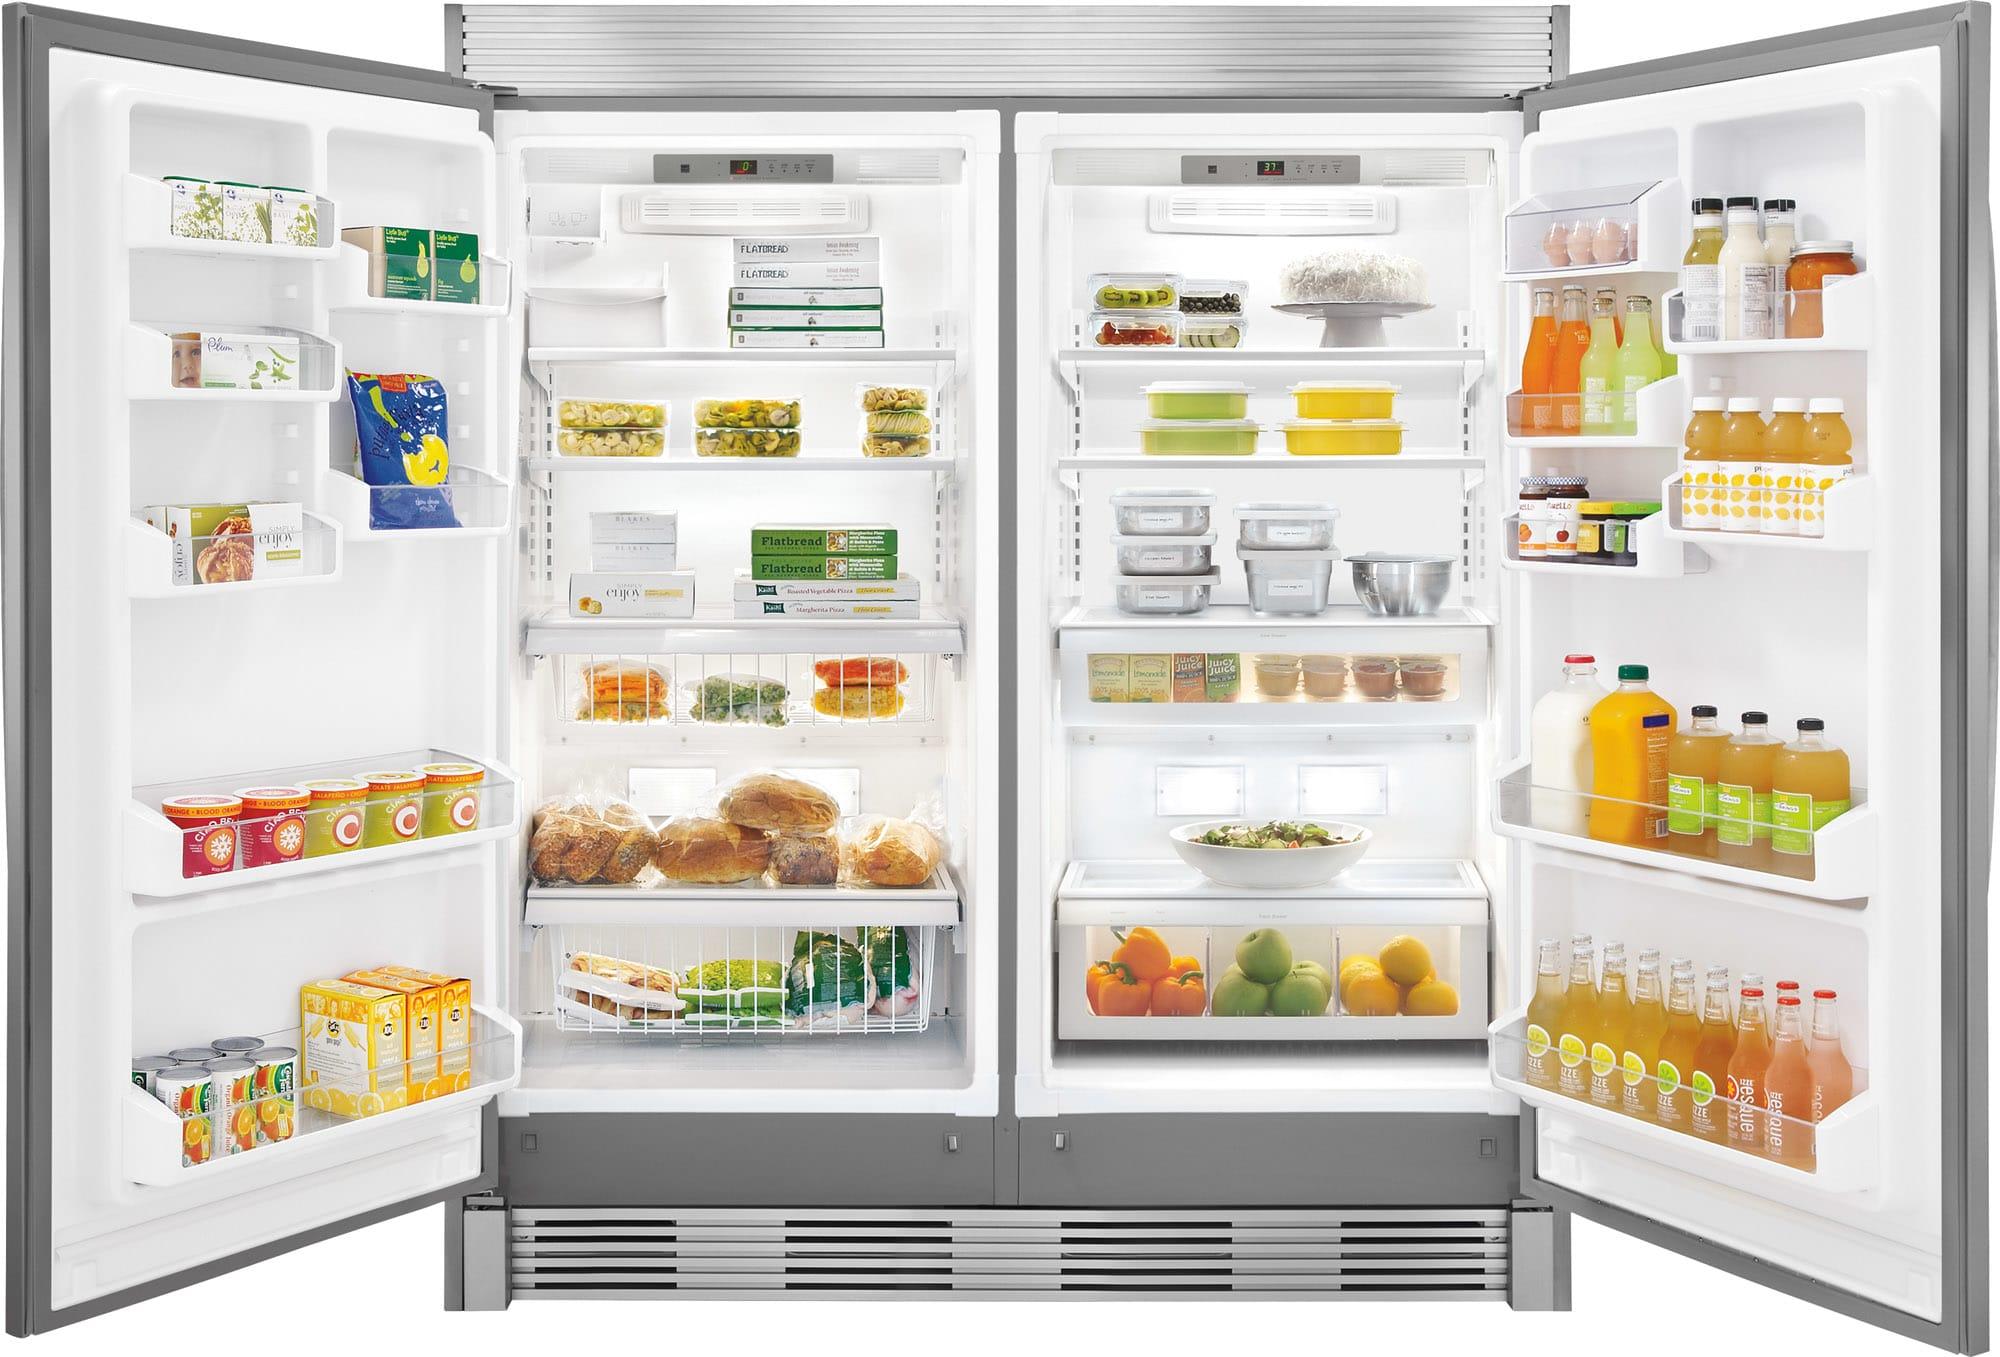 Model: FGRU19F6QF | 19 Cu. Ft. Single-Door Refrigerator